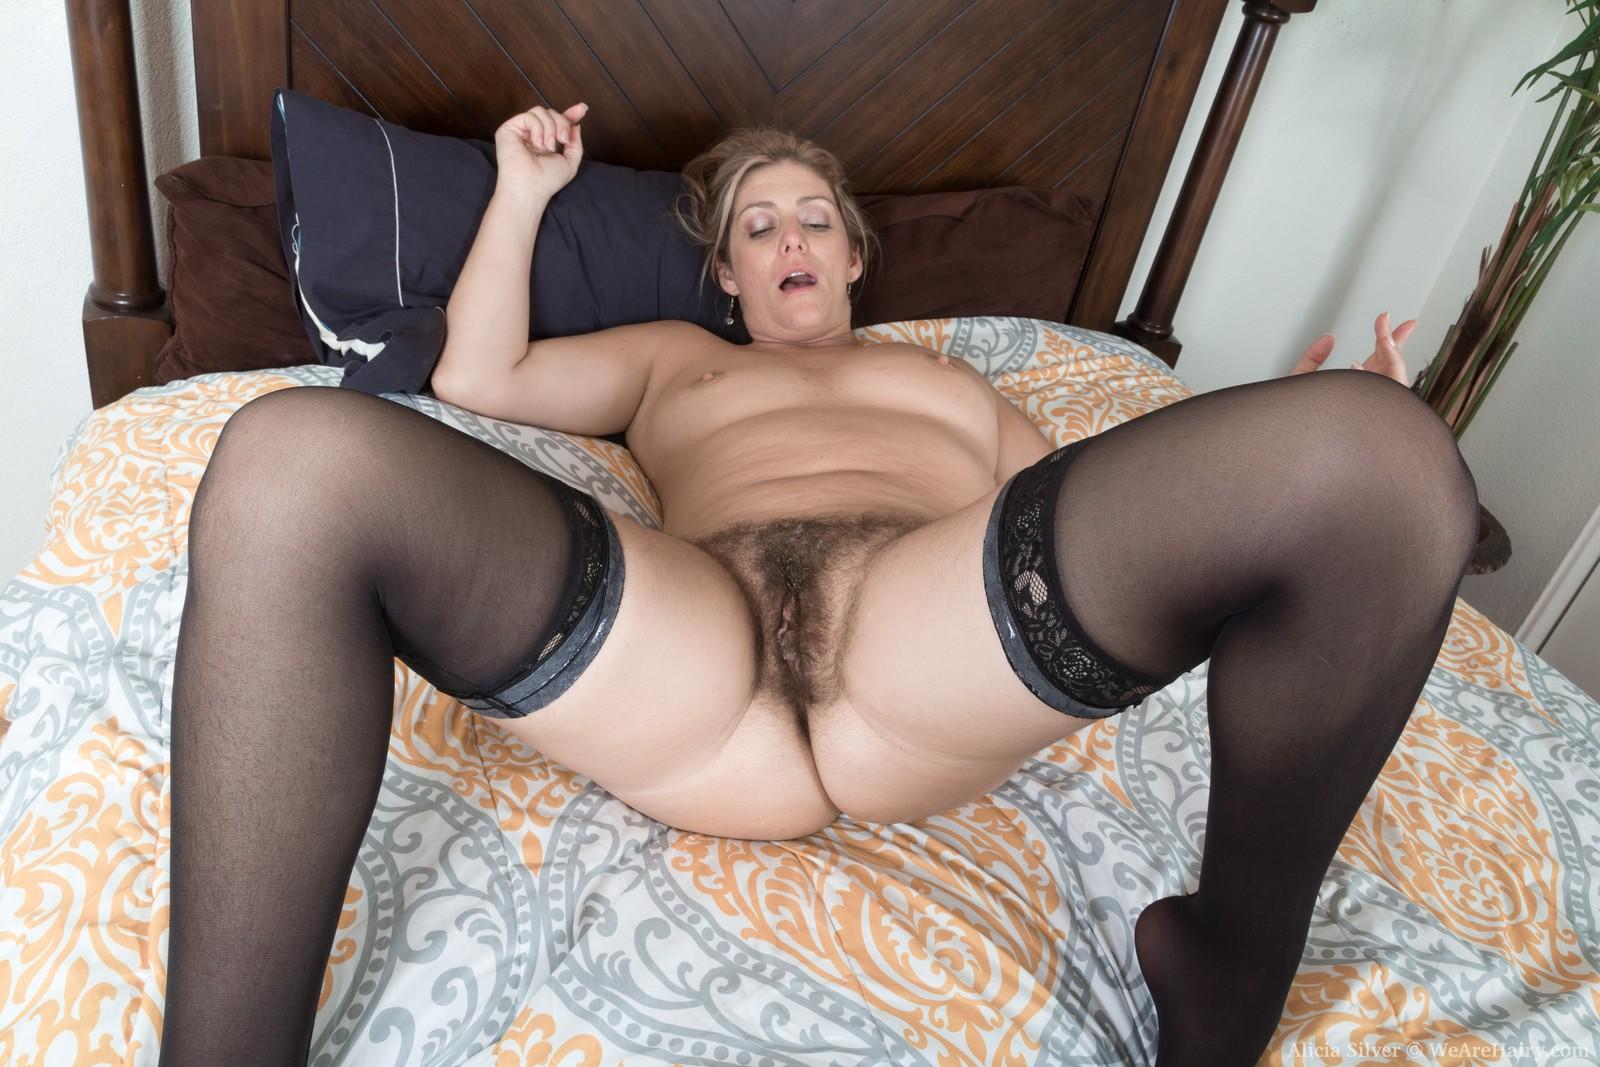 alicia-silver-has-hot-sex-in-her-bedroom16.jpg